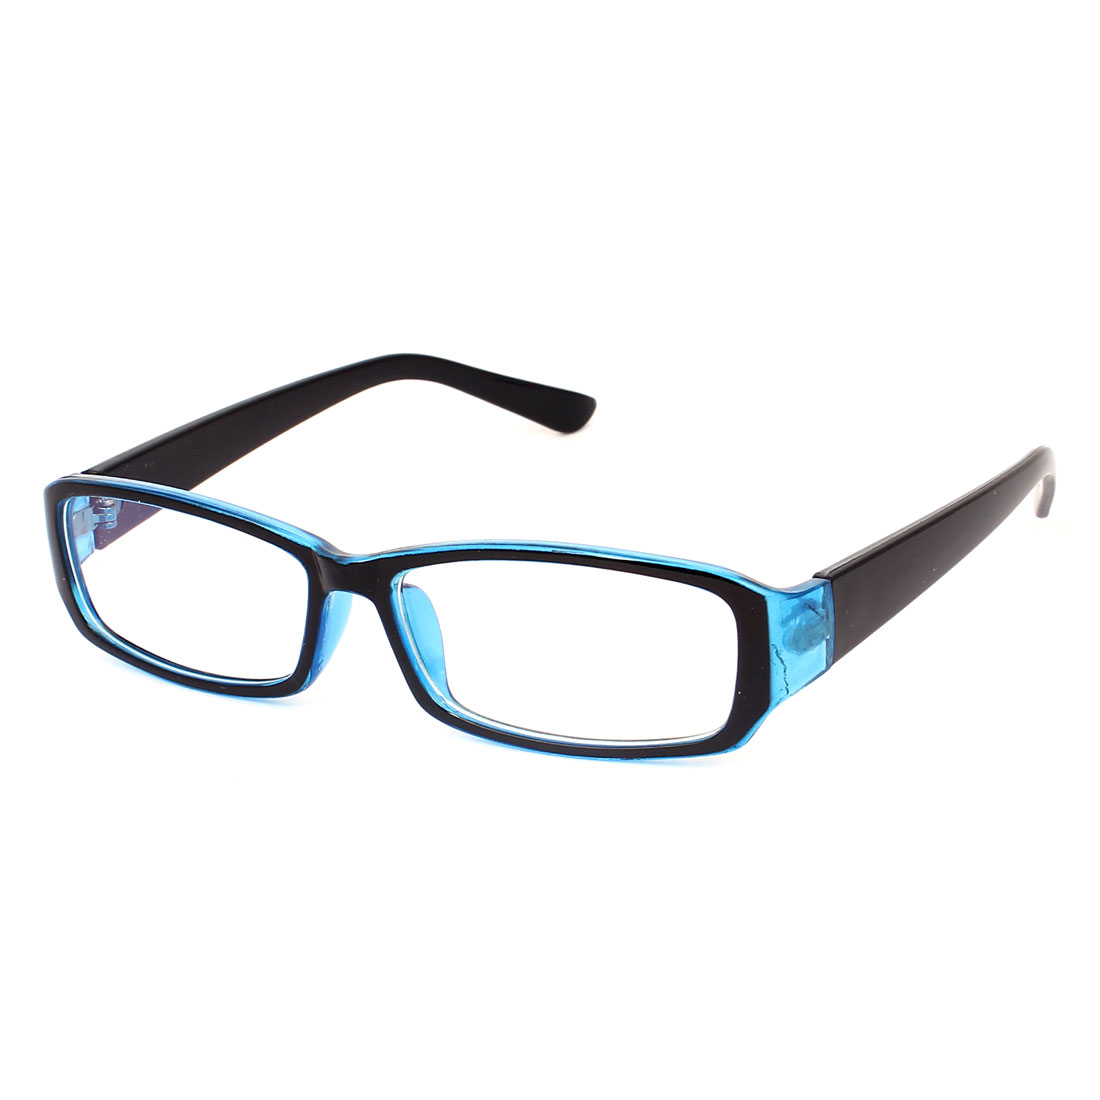 Eyeglass Frames At Sears Optical : Apple Bottoms Womens Prescription Glasses, AB714 Black ...